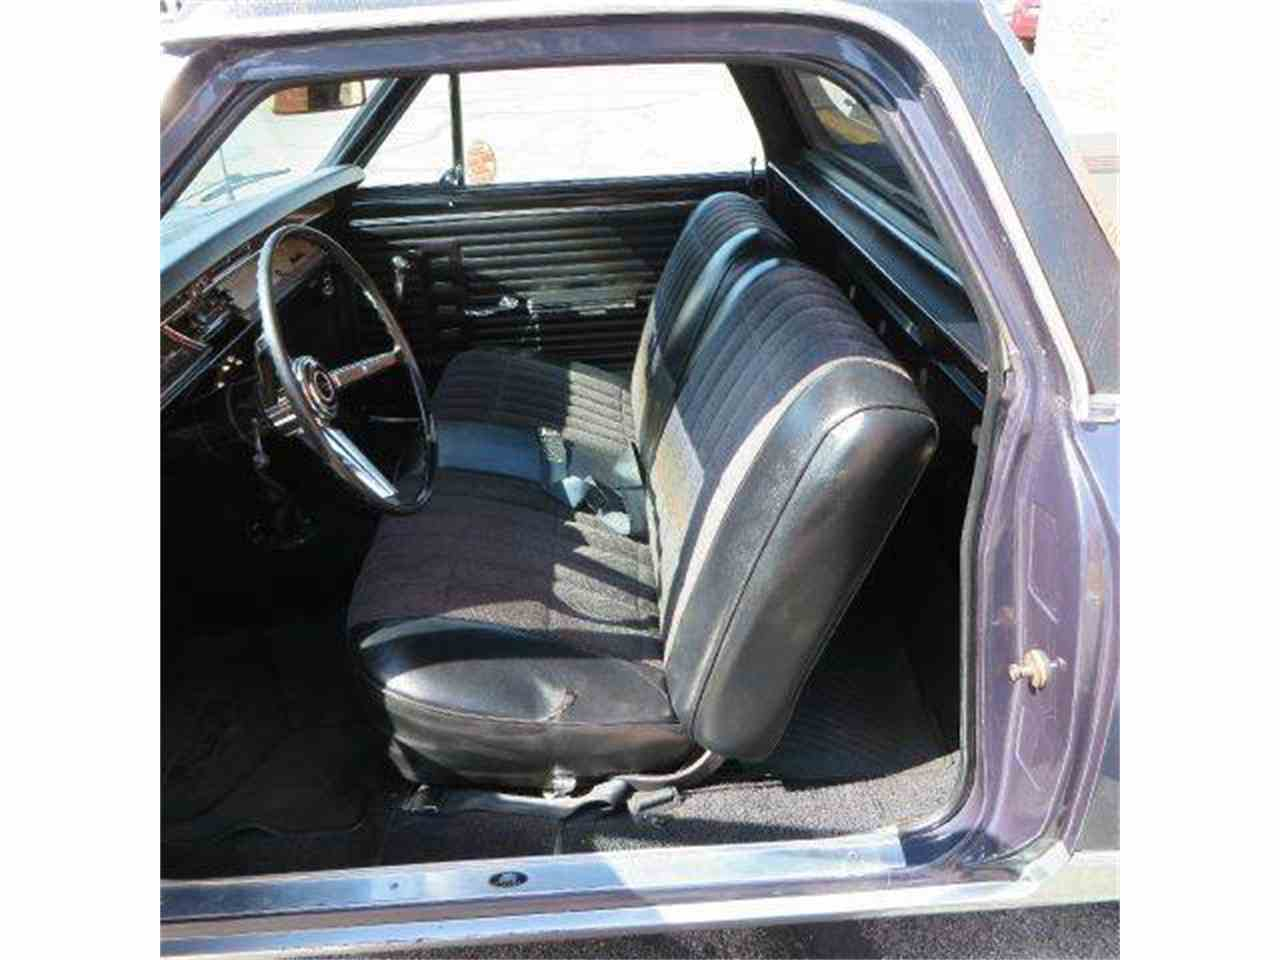 Large Picture of 1967 Chevrolet El Camino - $12,995.00 - E8OC